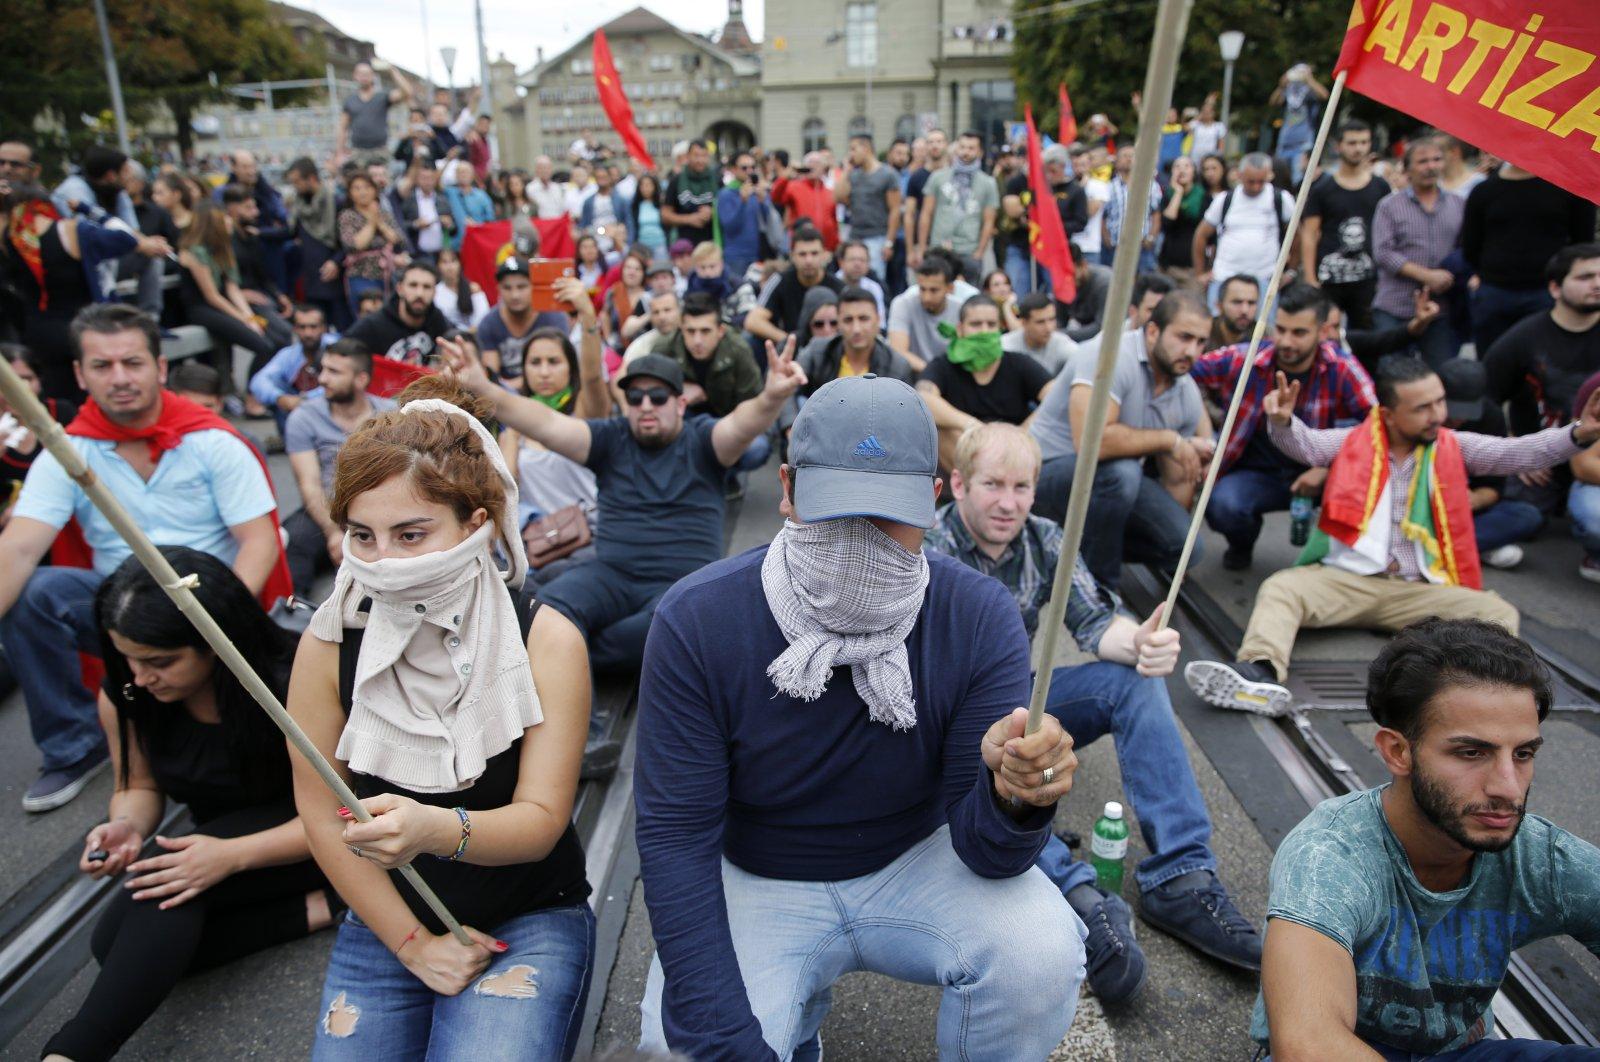 Protesters in Switzerland stage a demonstration on the Kirchenfeld bridge, Bern, Switzerland, Sept. 12, 2015. (AP Photo)